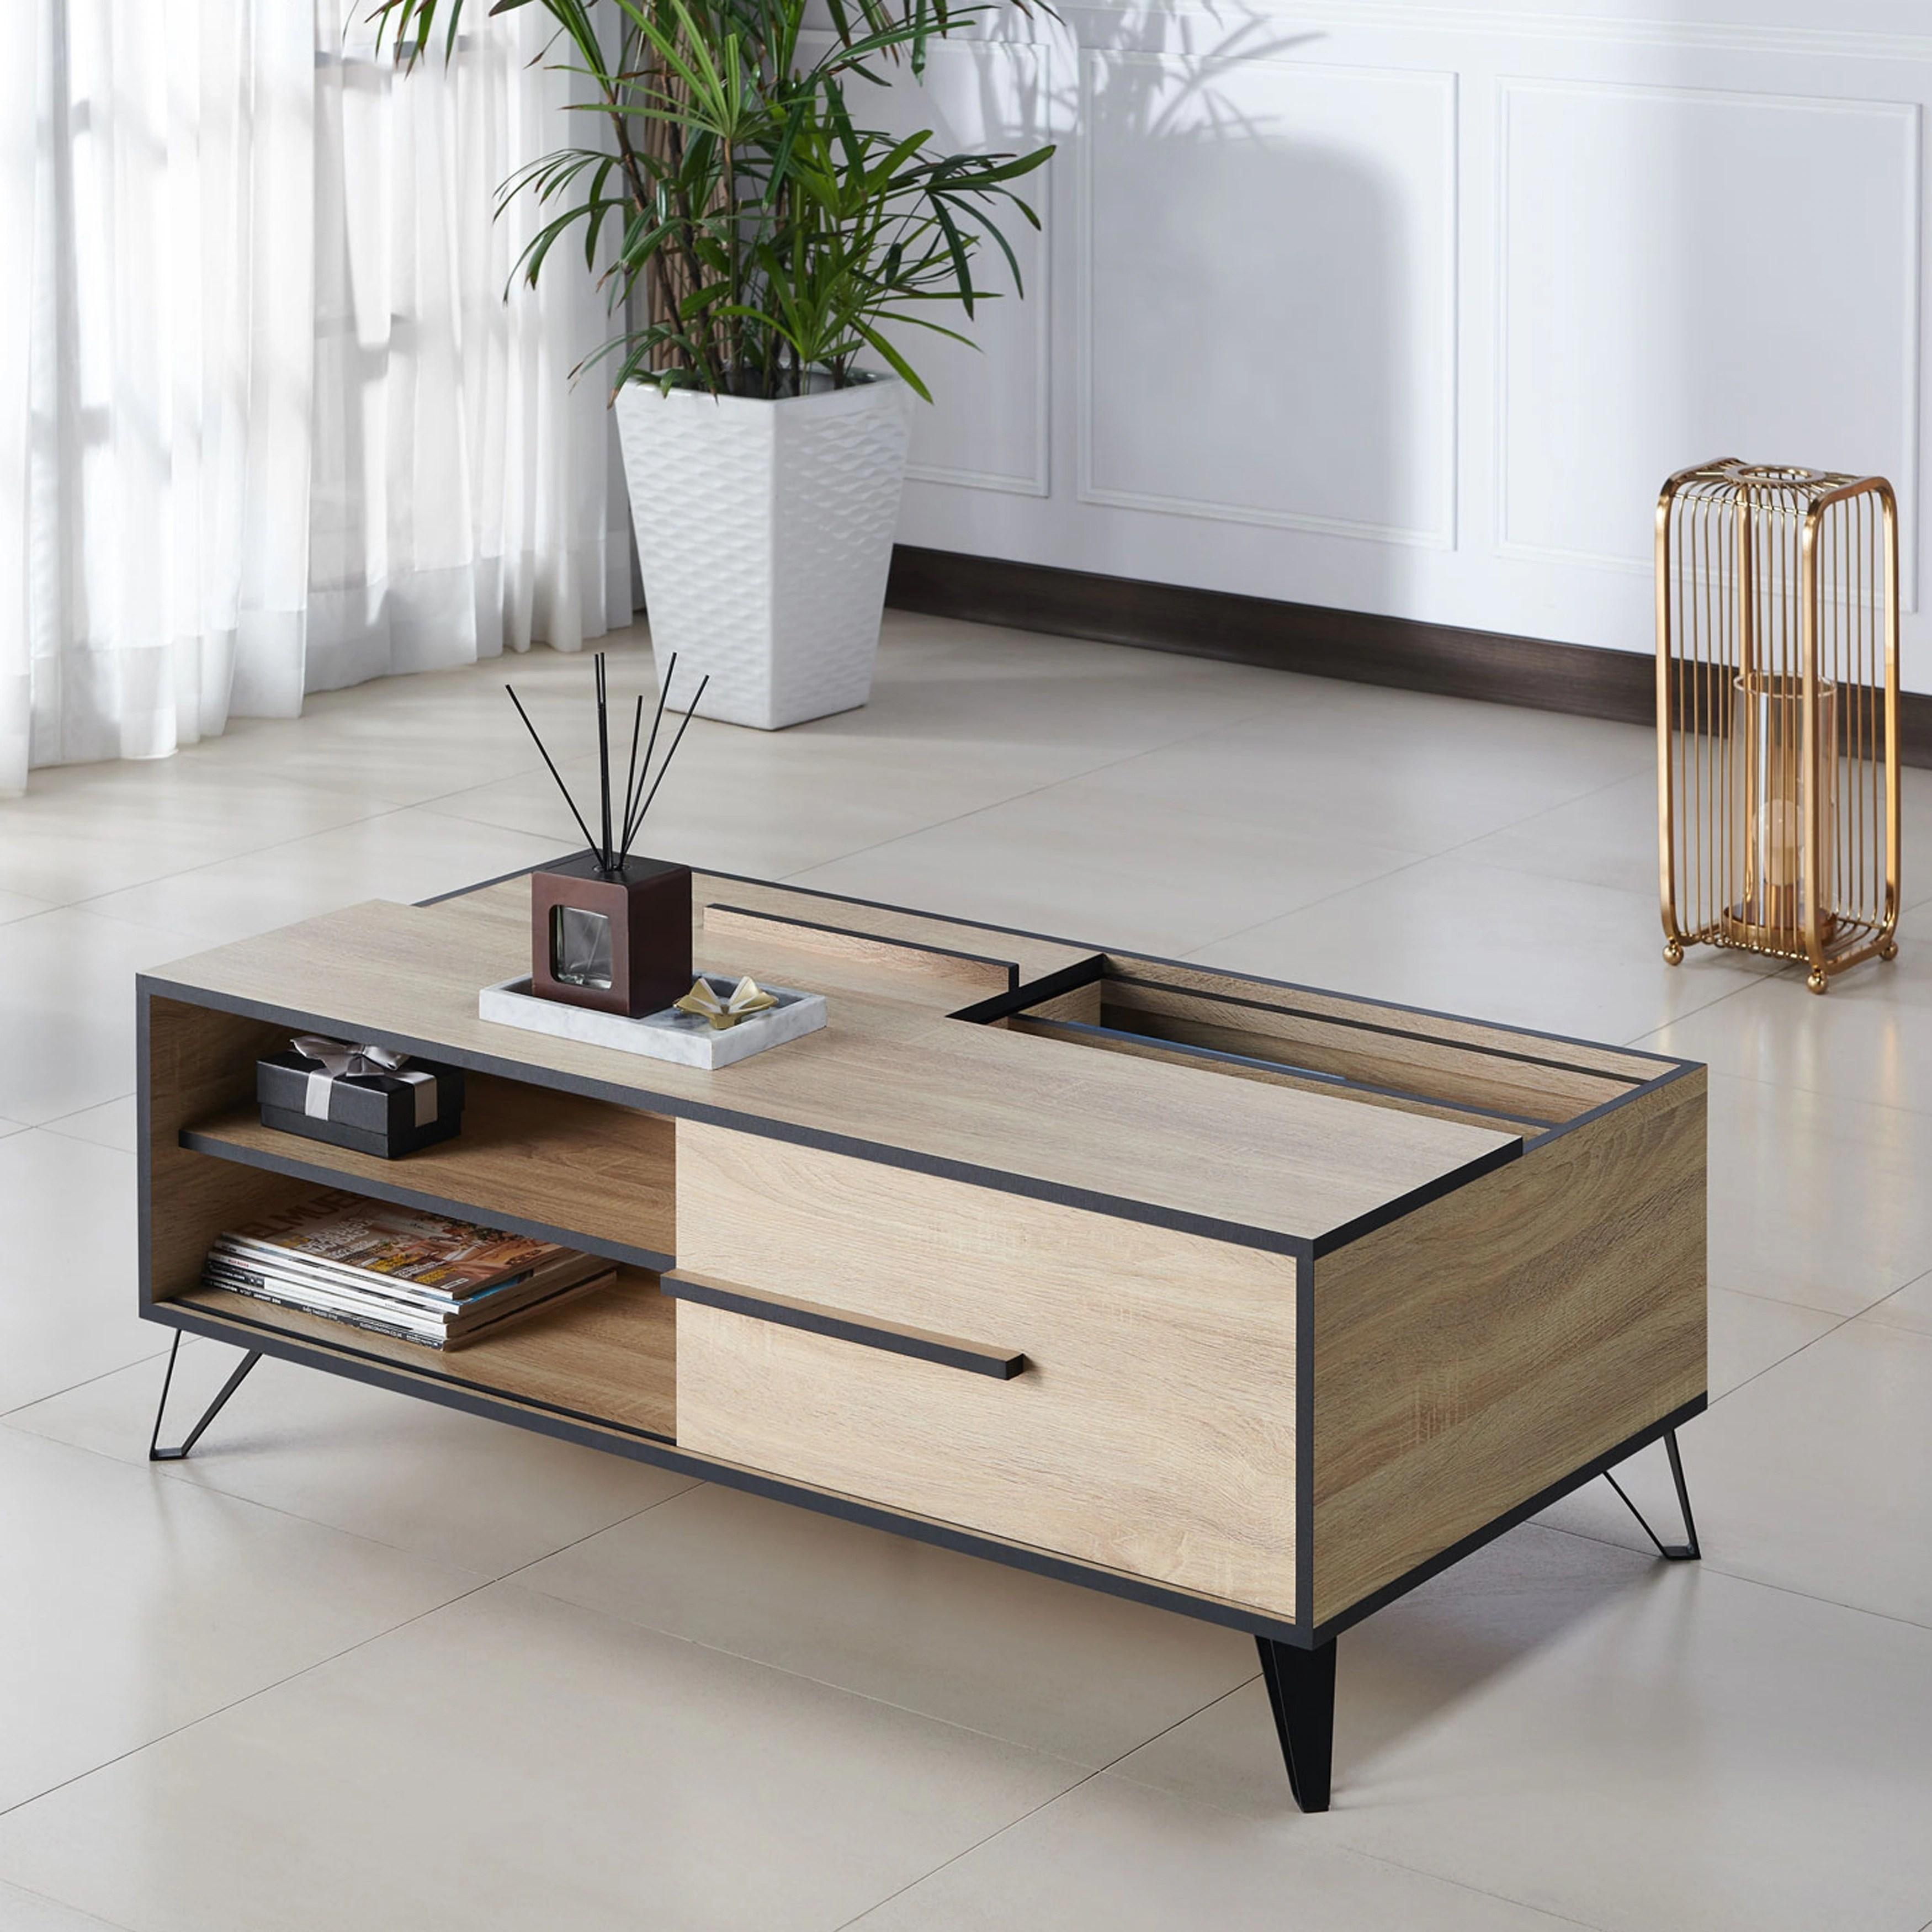 Shop Carbon Loft Feleni Mid Century Modern Storage Coffee Table Overstock 26058404